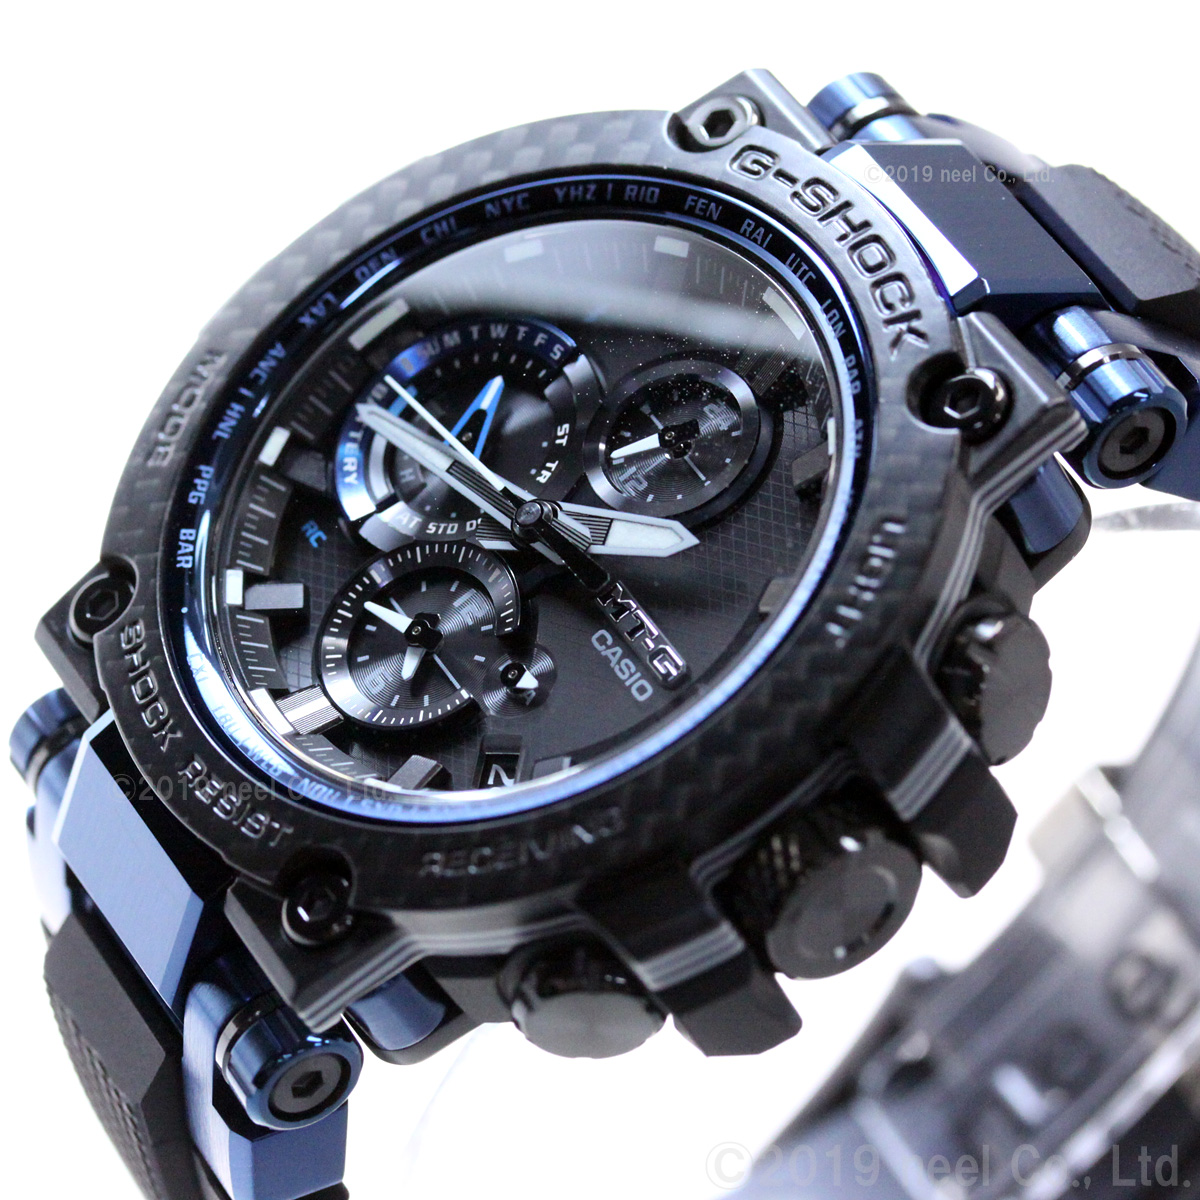 Gショック MT-G G-SHOCK 電波 ソーラー メンズ 腕時計 MTG-B1000XB-1AJF ジーショック